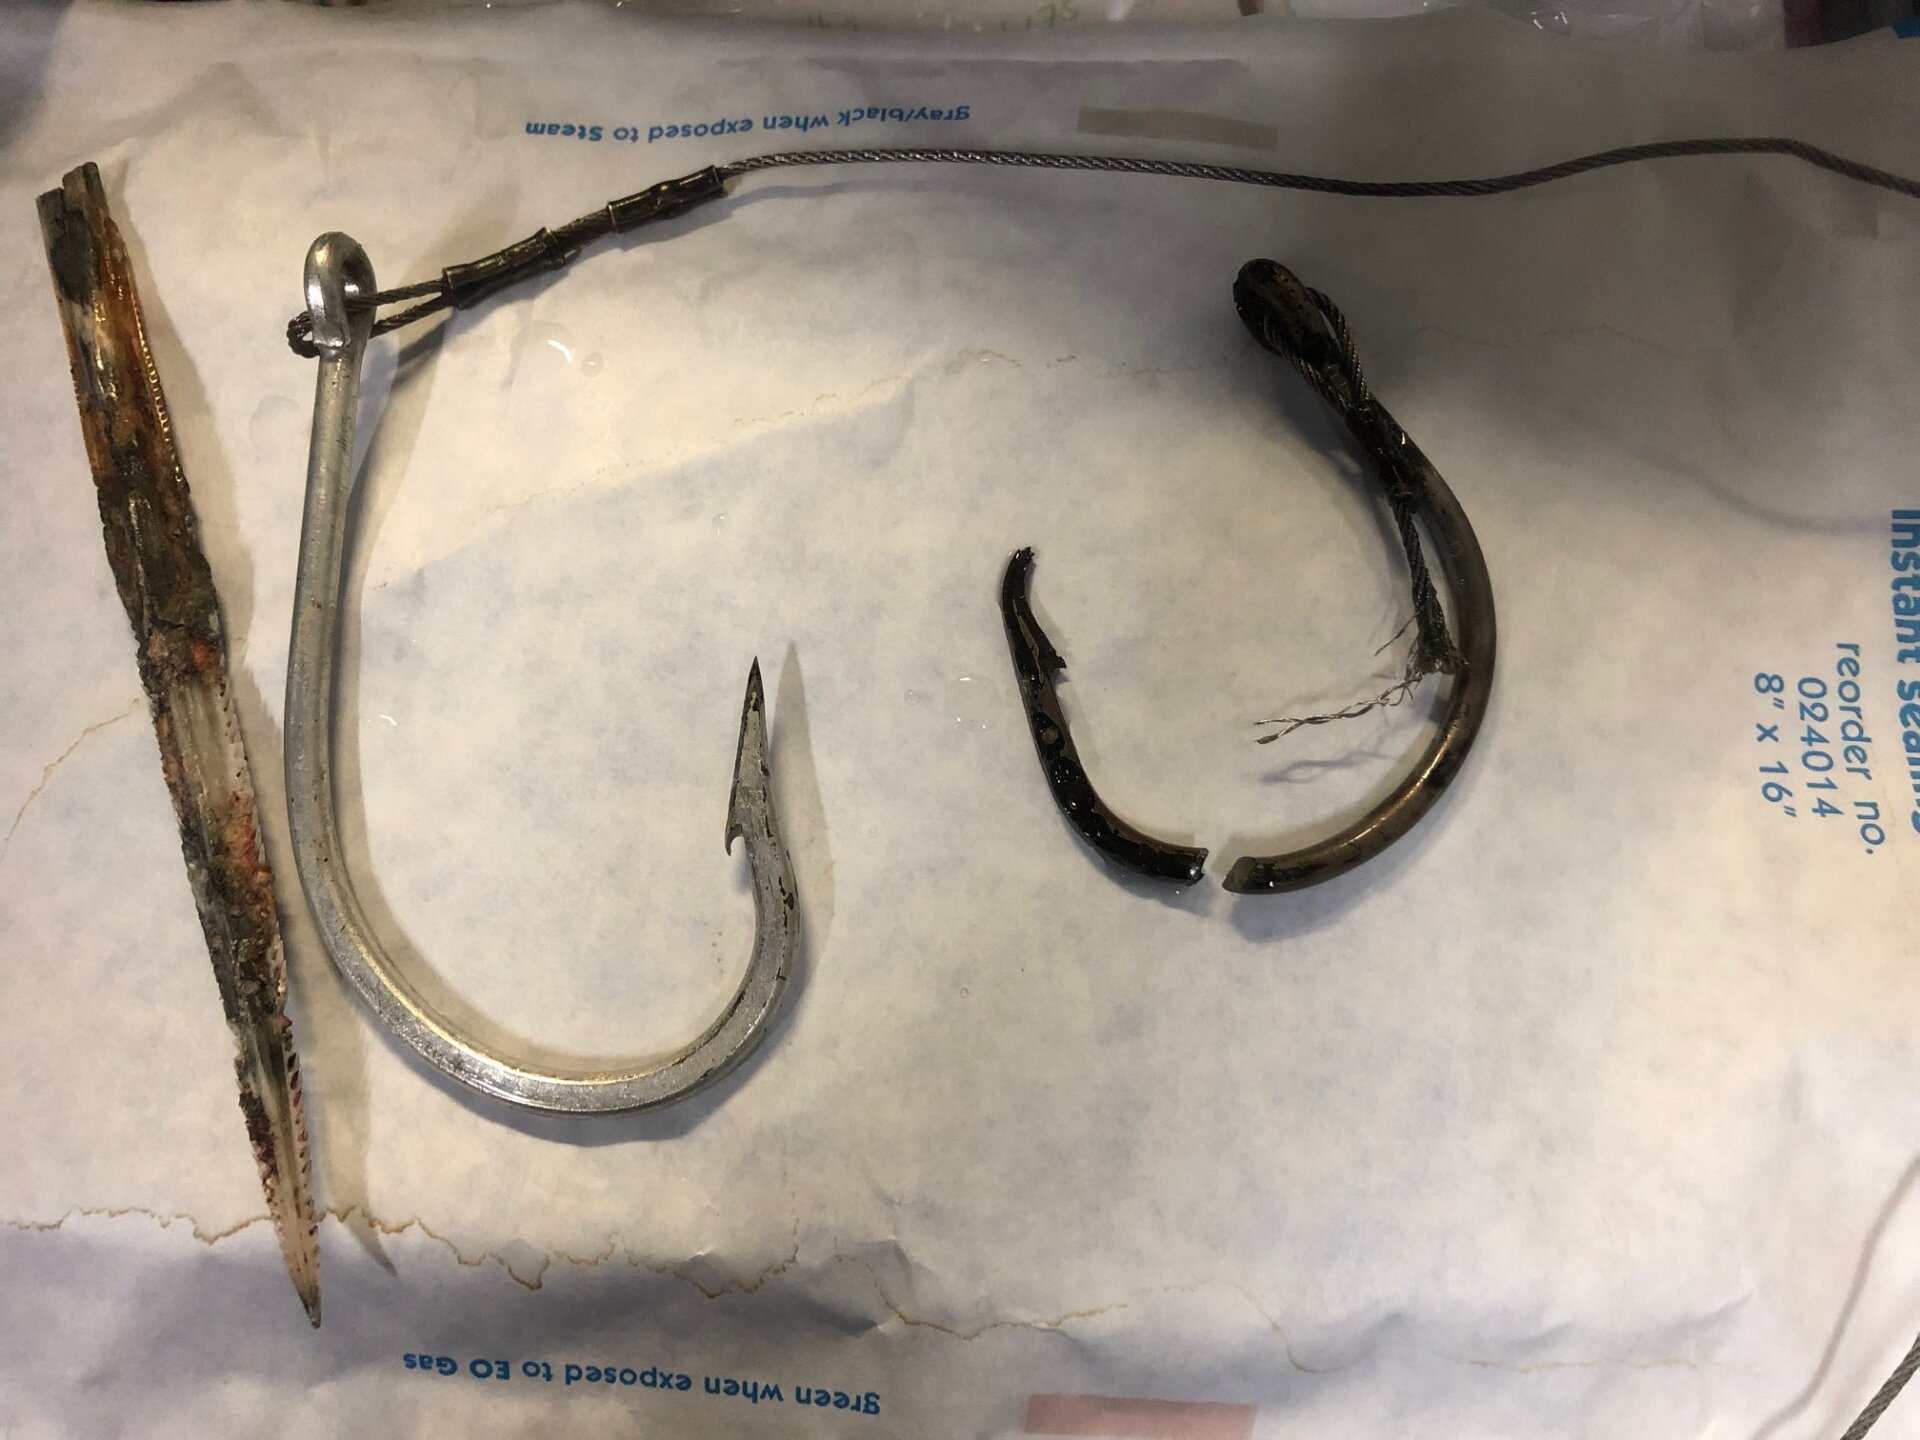 Photos: North Carolina Aquarium vet removes two fish hooks, stingray barb from loggerheadturtle